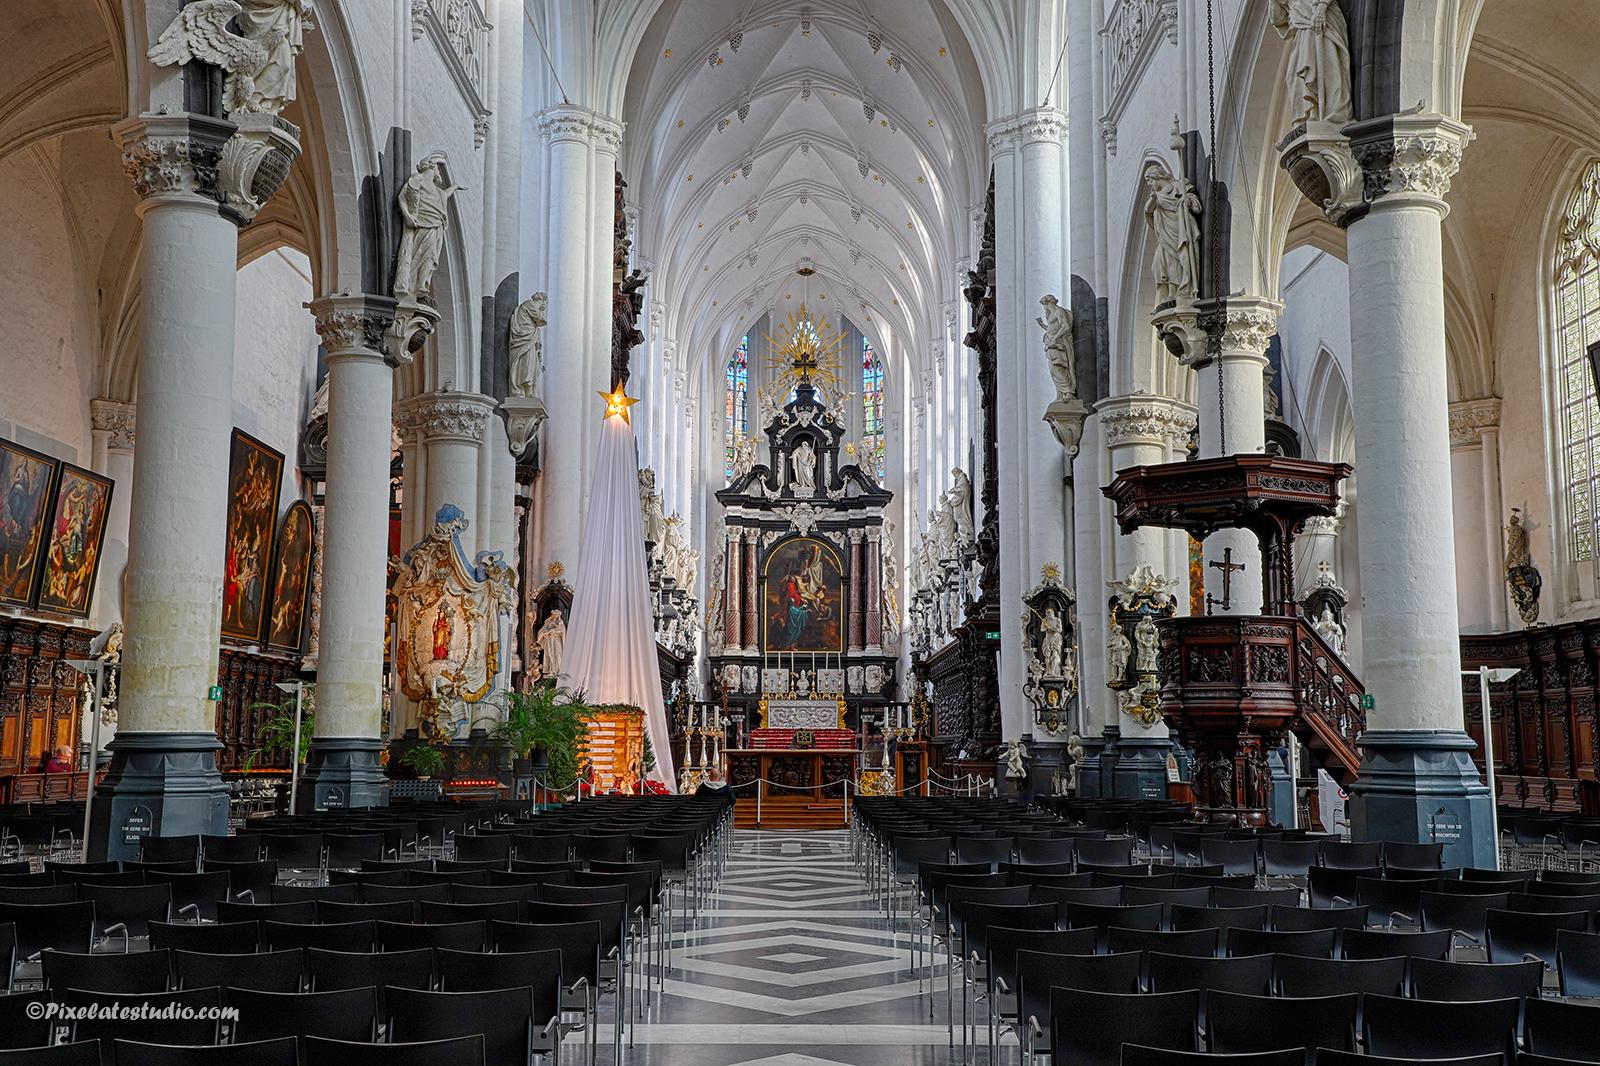 interieur van de Paulus Kerk te Antwerpen, mooie foto met kerstboom